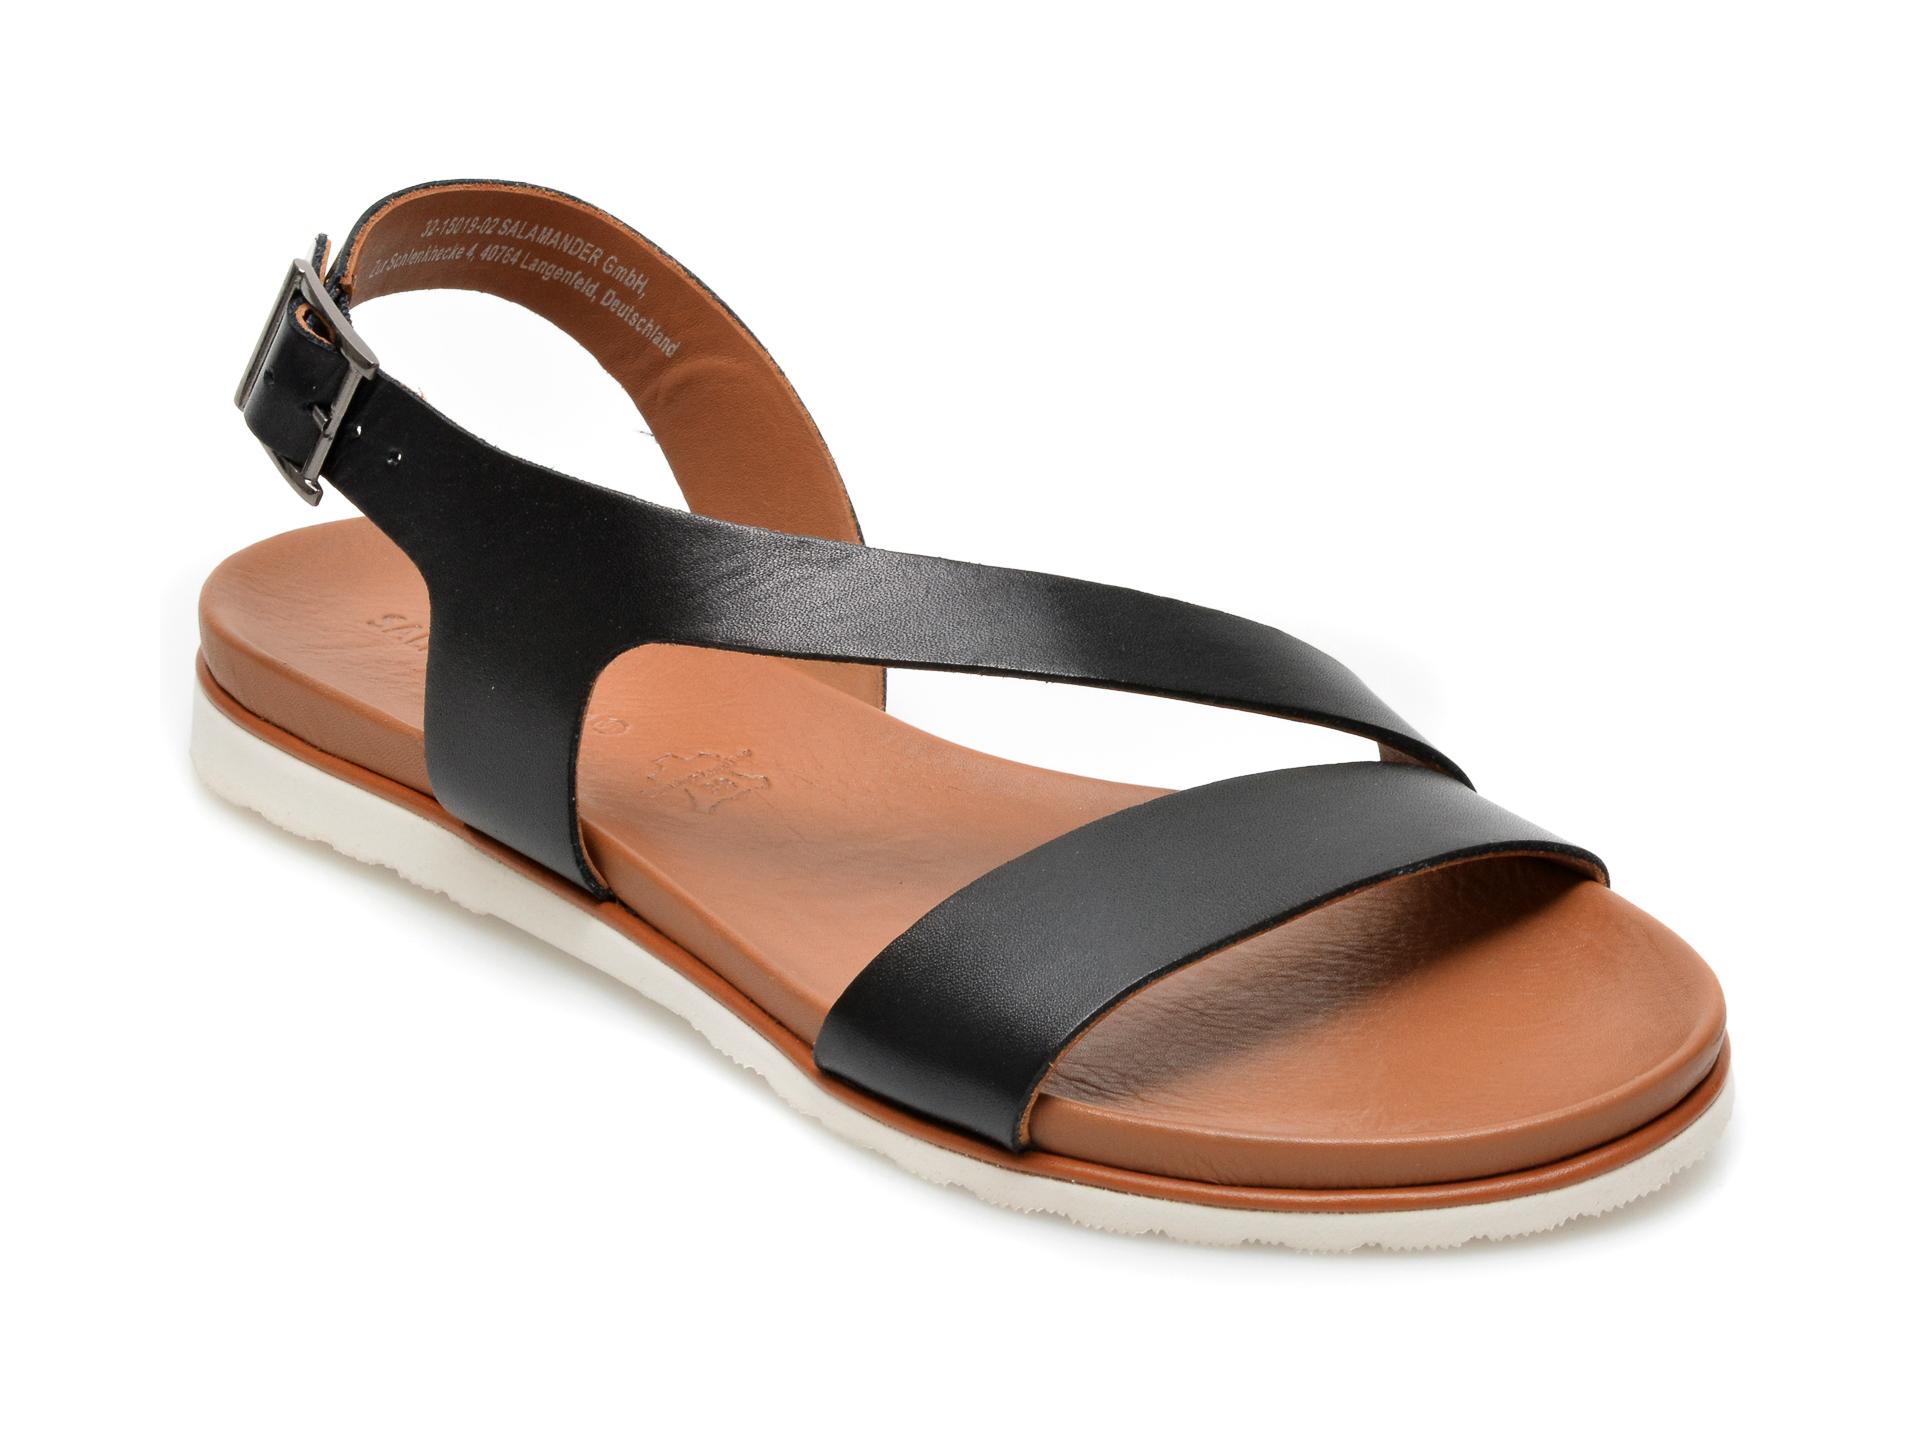 Sandale SALAMANDER negre, 15019, din piele naturala imagine otter.ro 2021